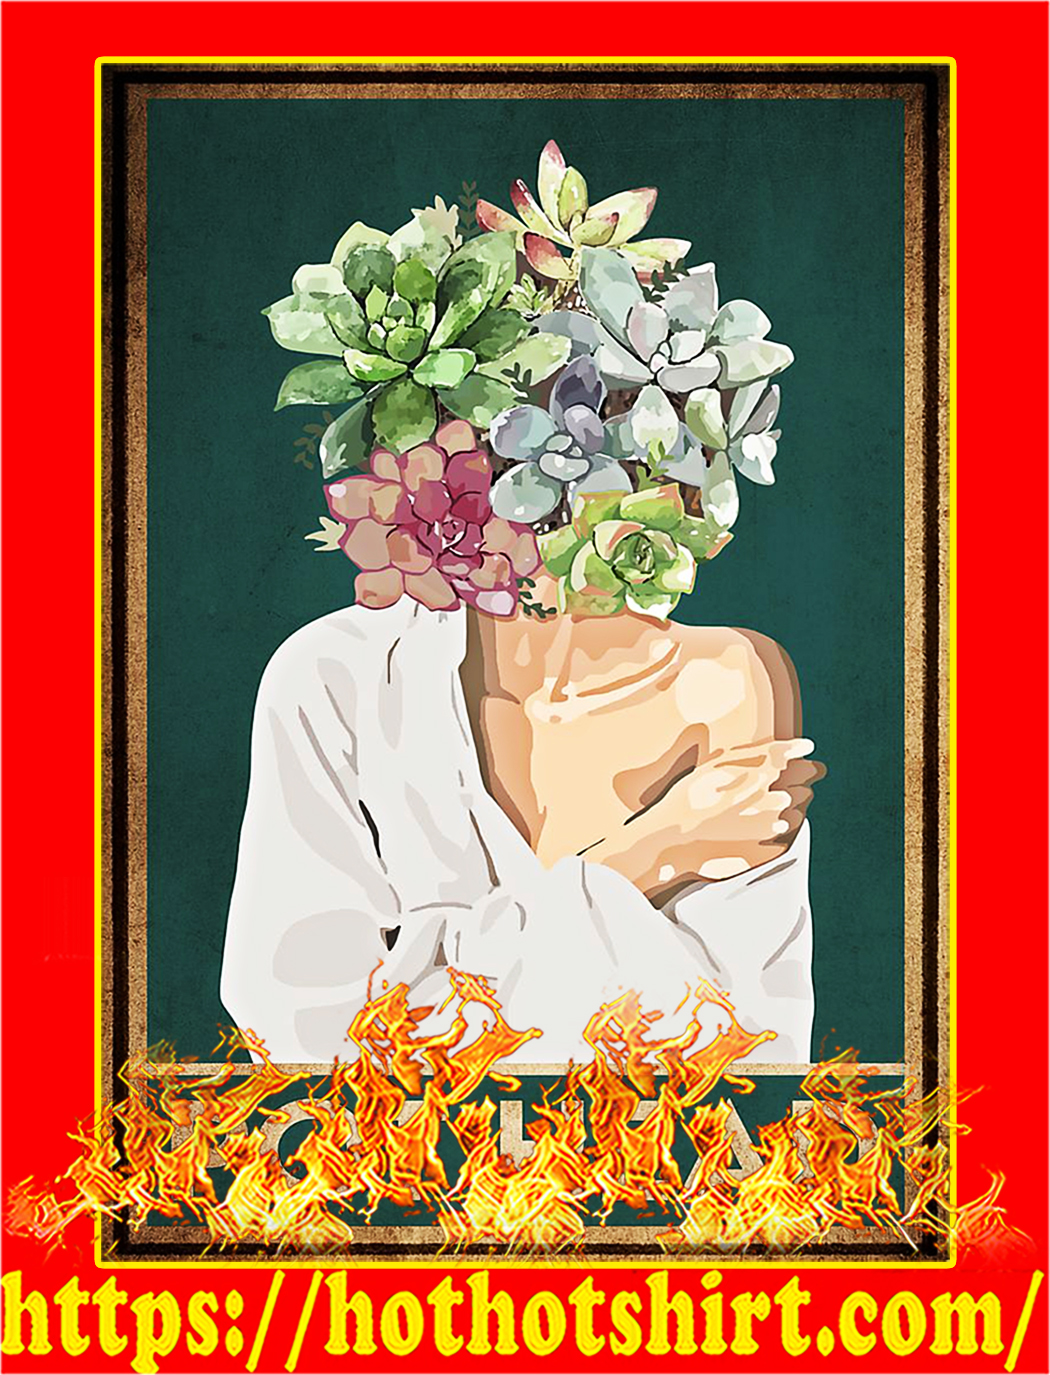 Pot head garden poster - A2